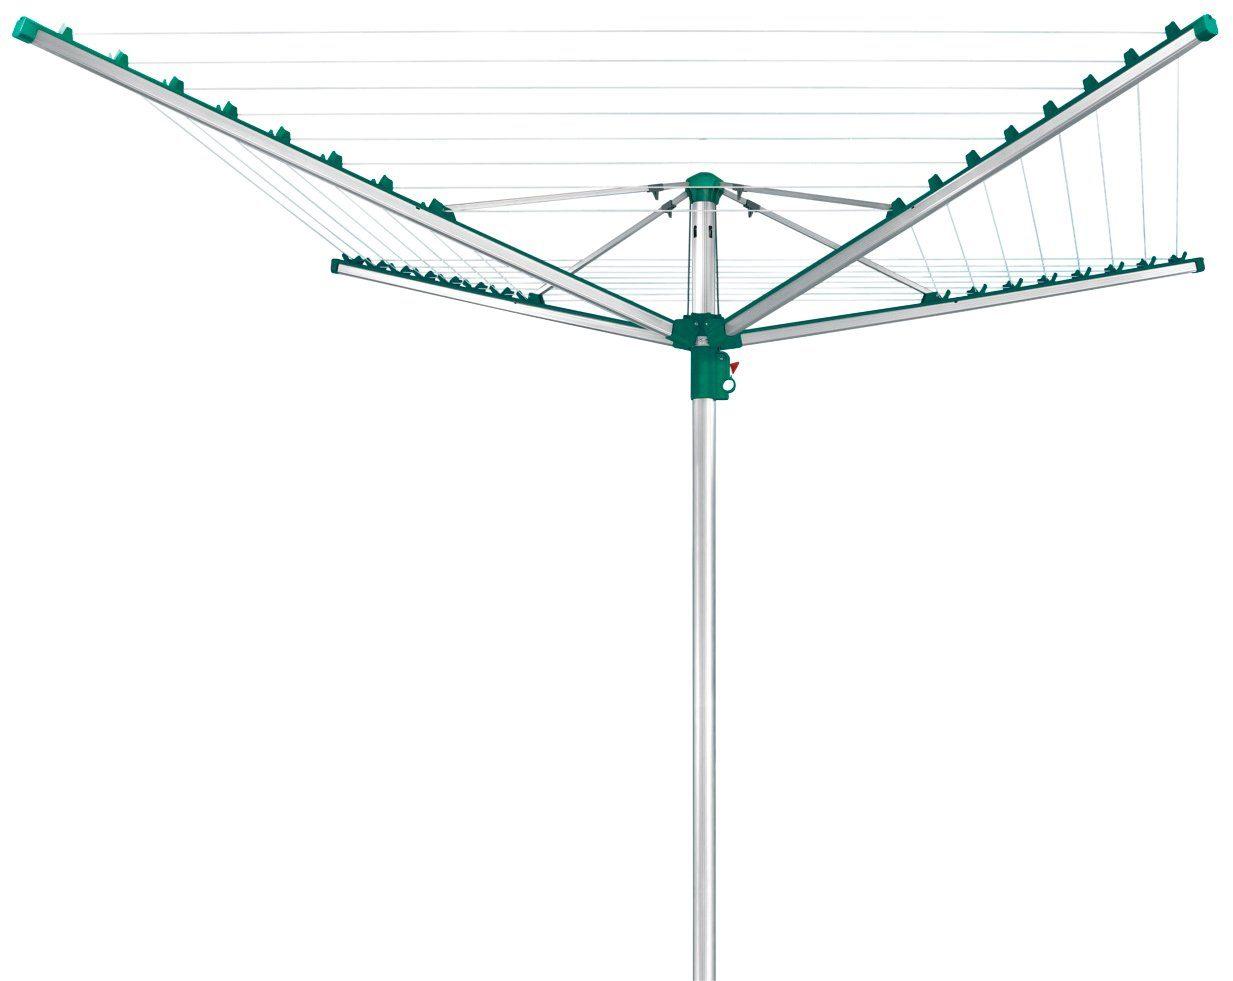 Leifheit Wäschespinne »Linomatic 500 Comfort«